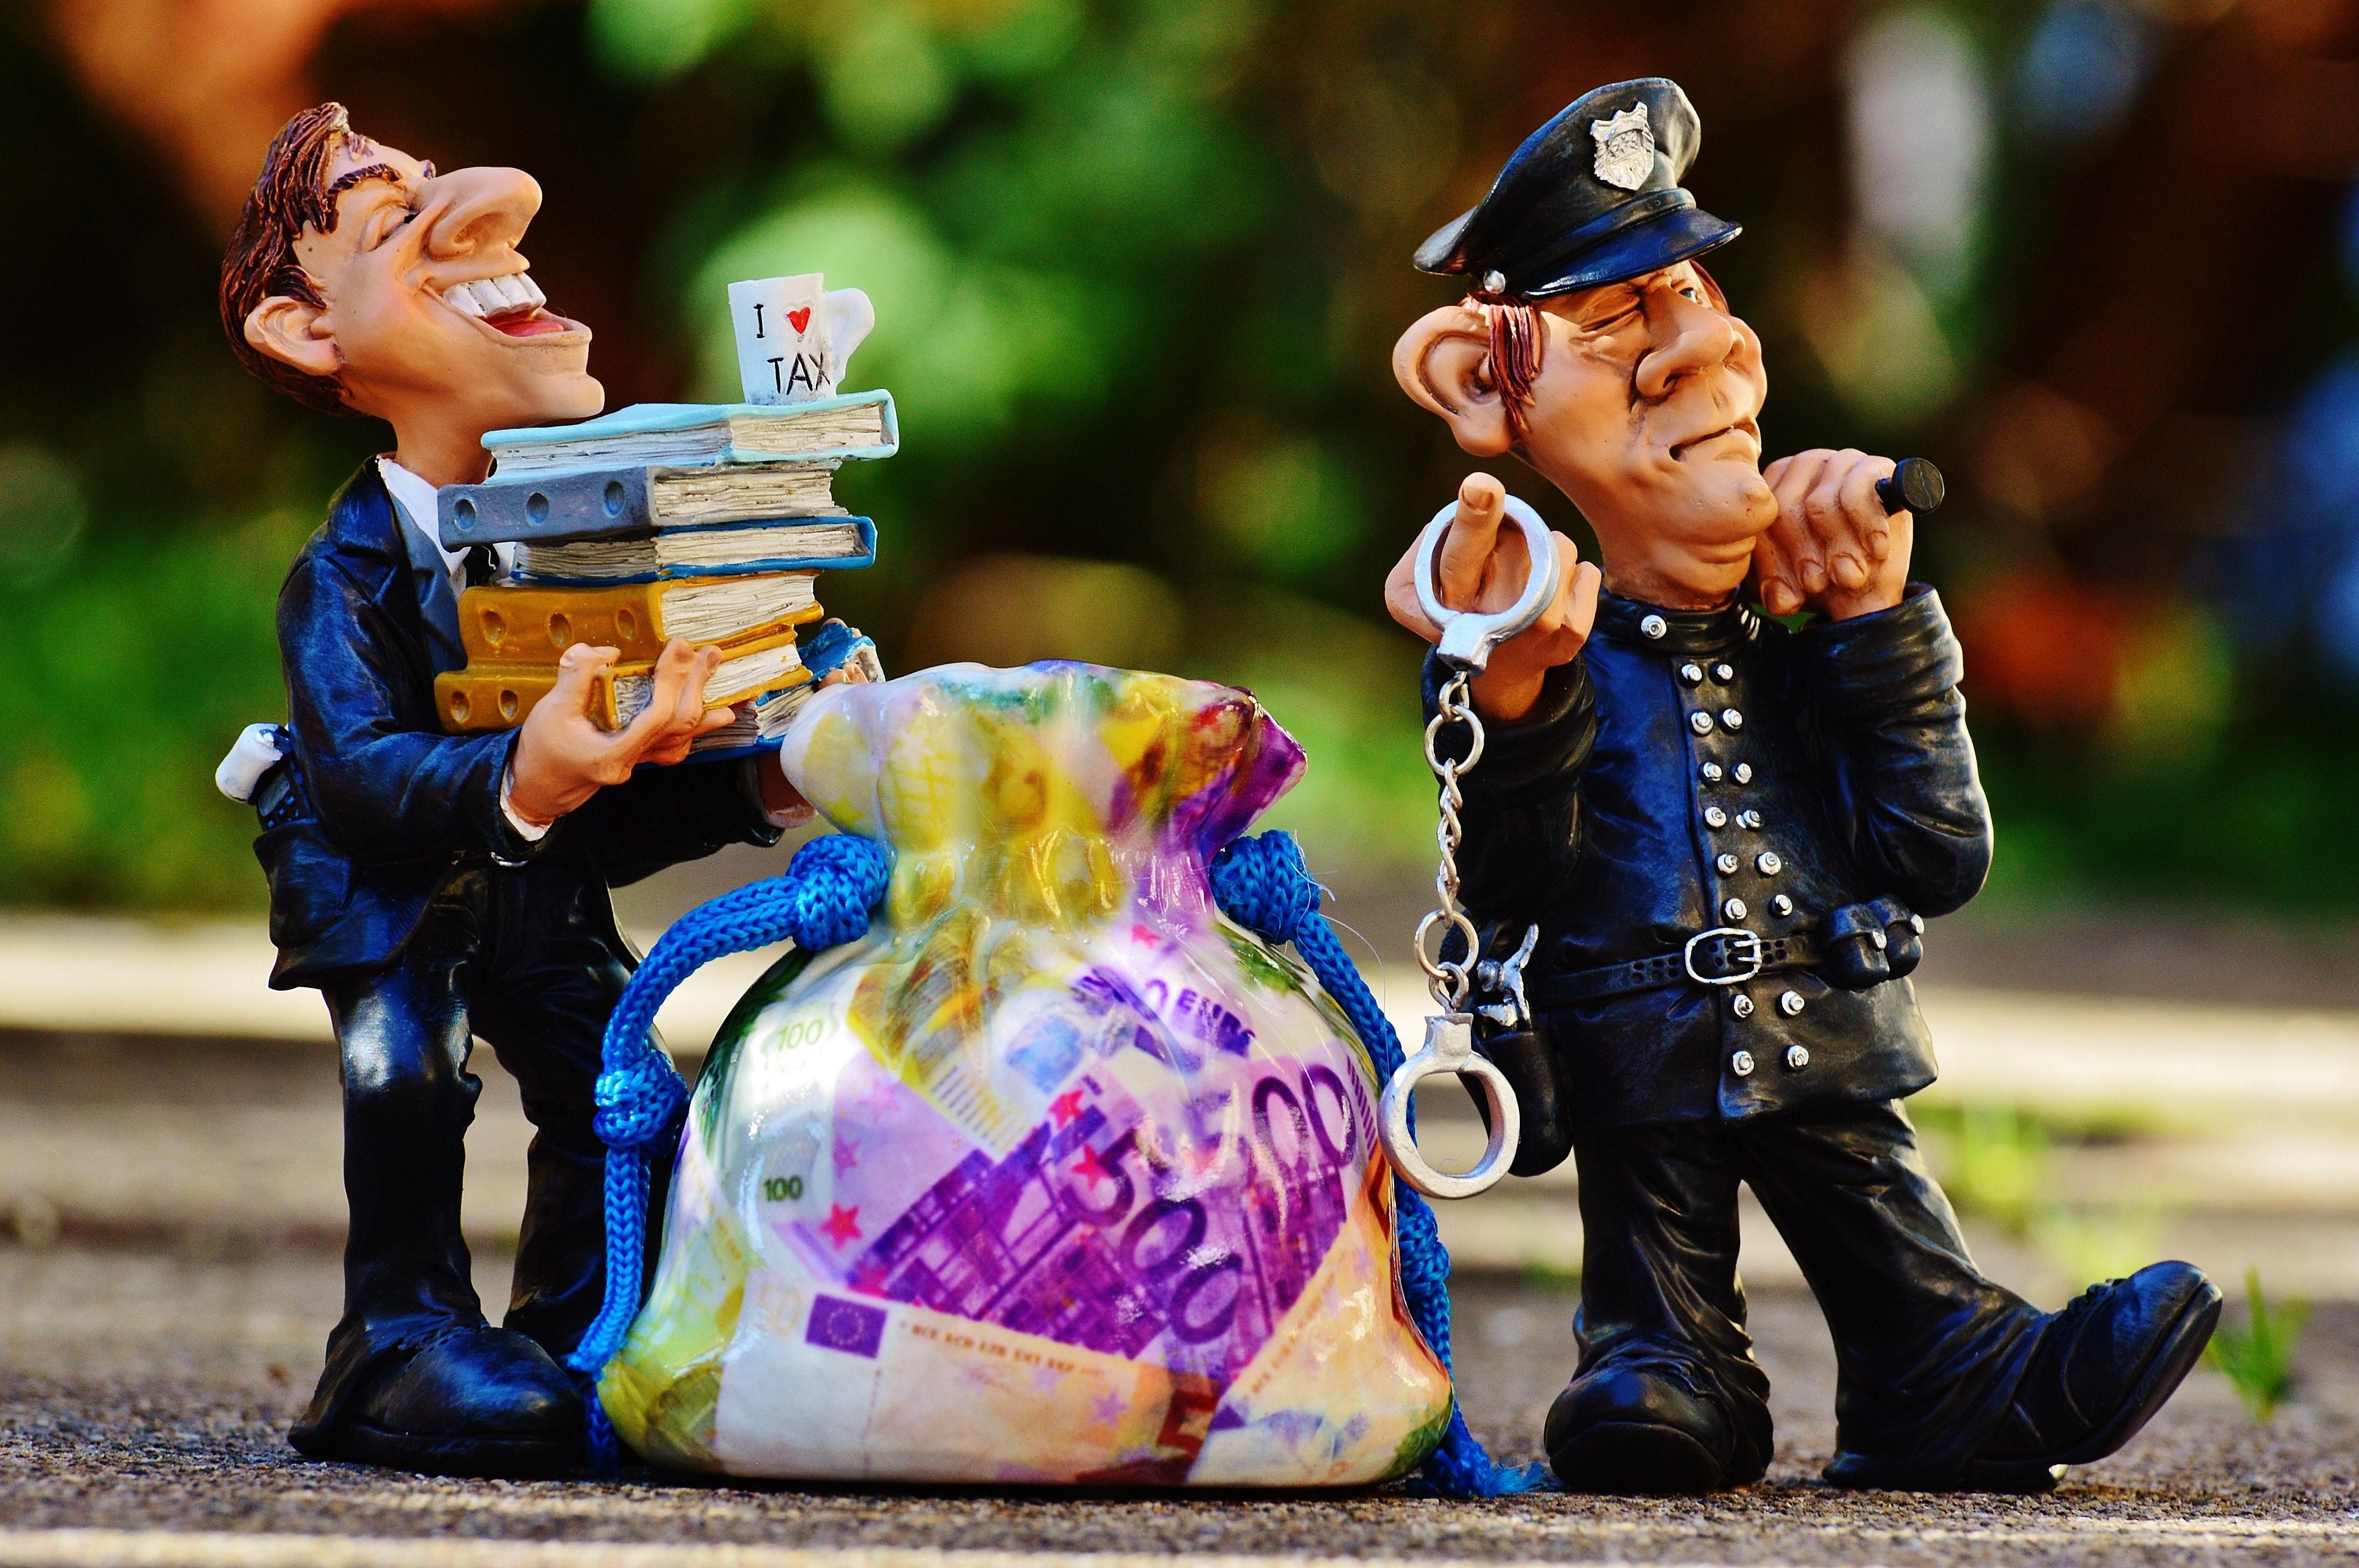 debt consolidation scams